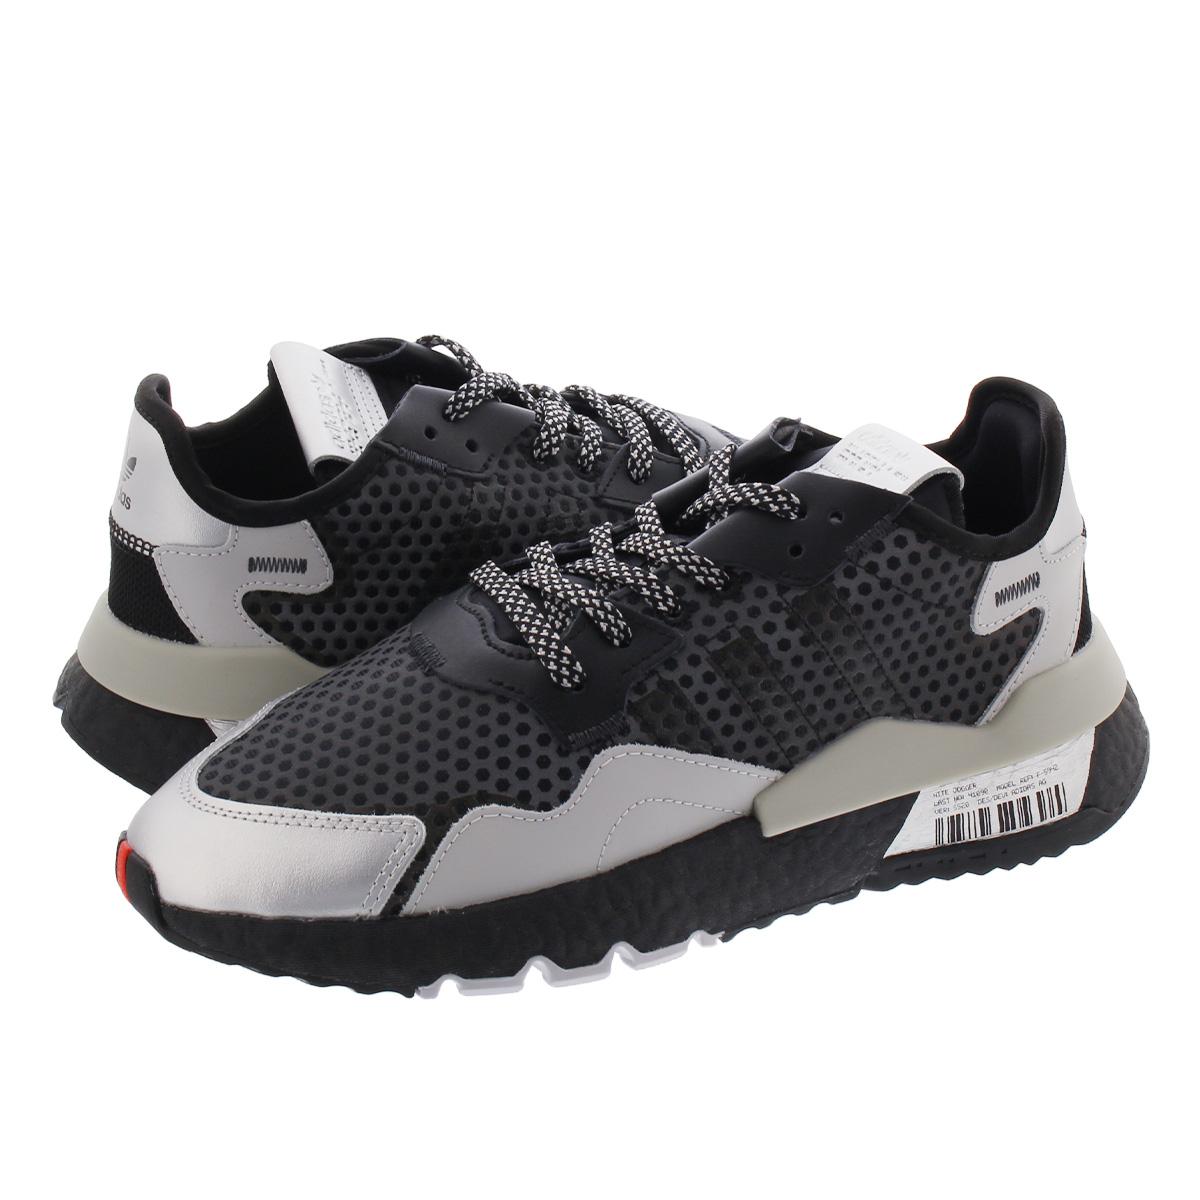 adidas NITE JOGGER アディダス ナイト ジョガー CORE BLACK/SILVER METALLIC/GREY TWO ef5407